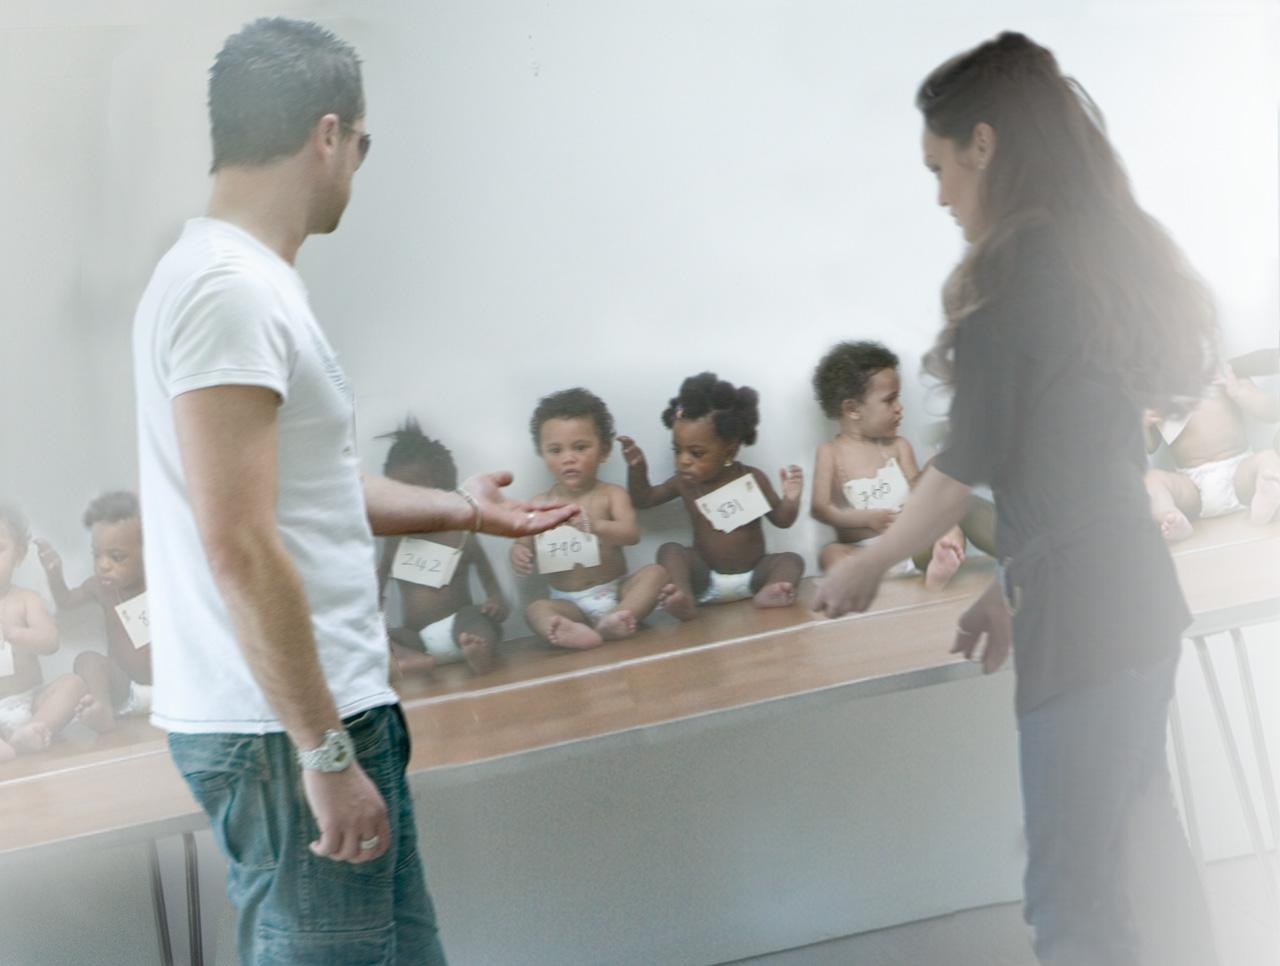 Alison Jackson: Brangelinas at the Orphanage